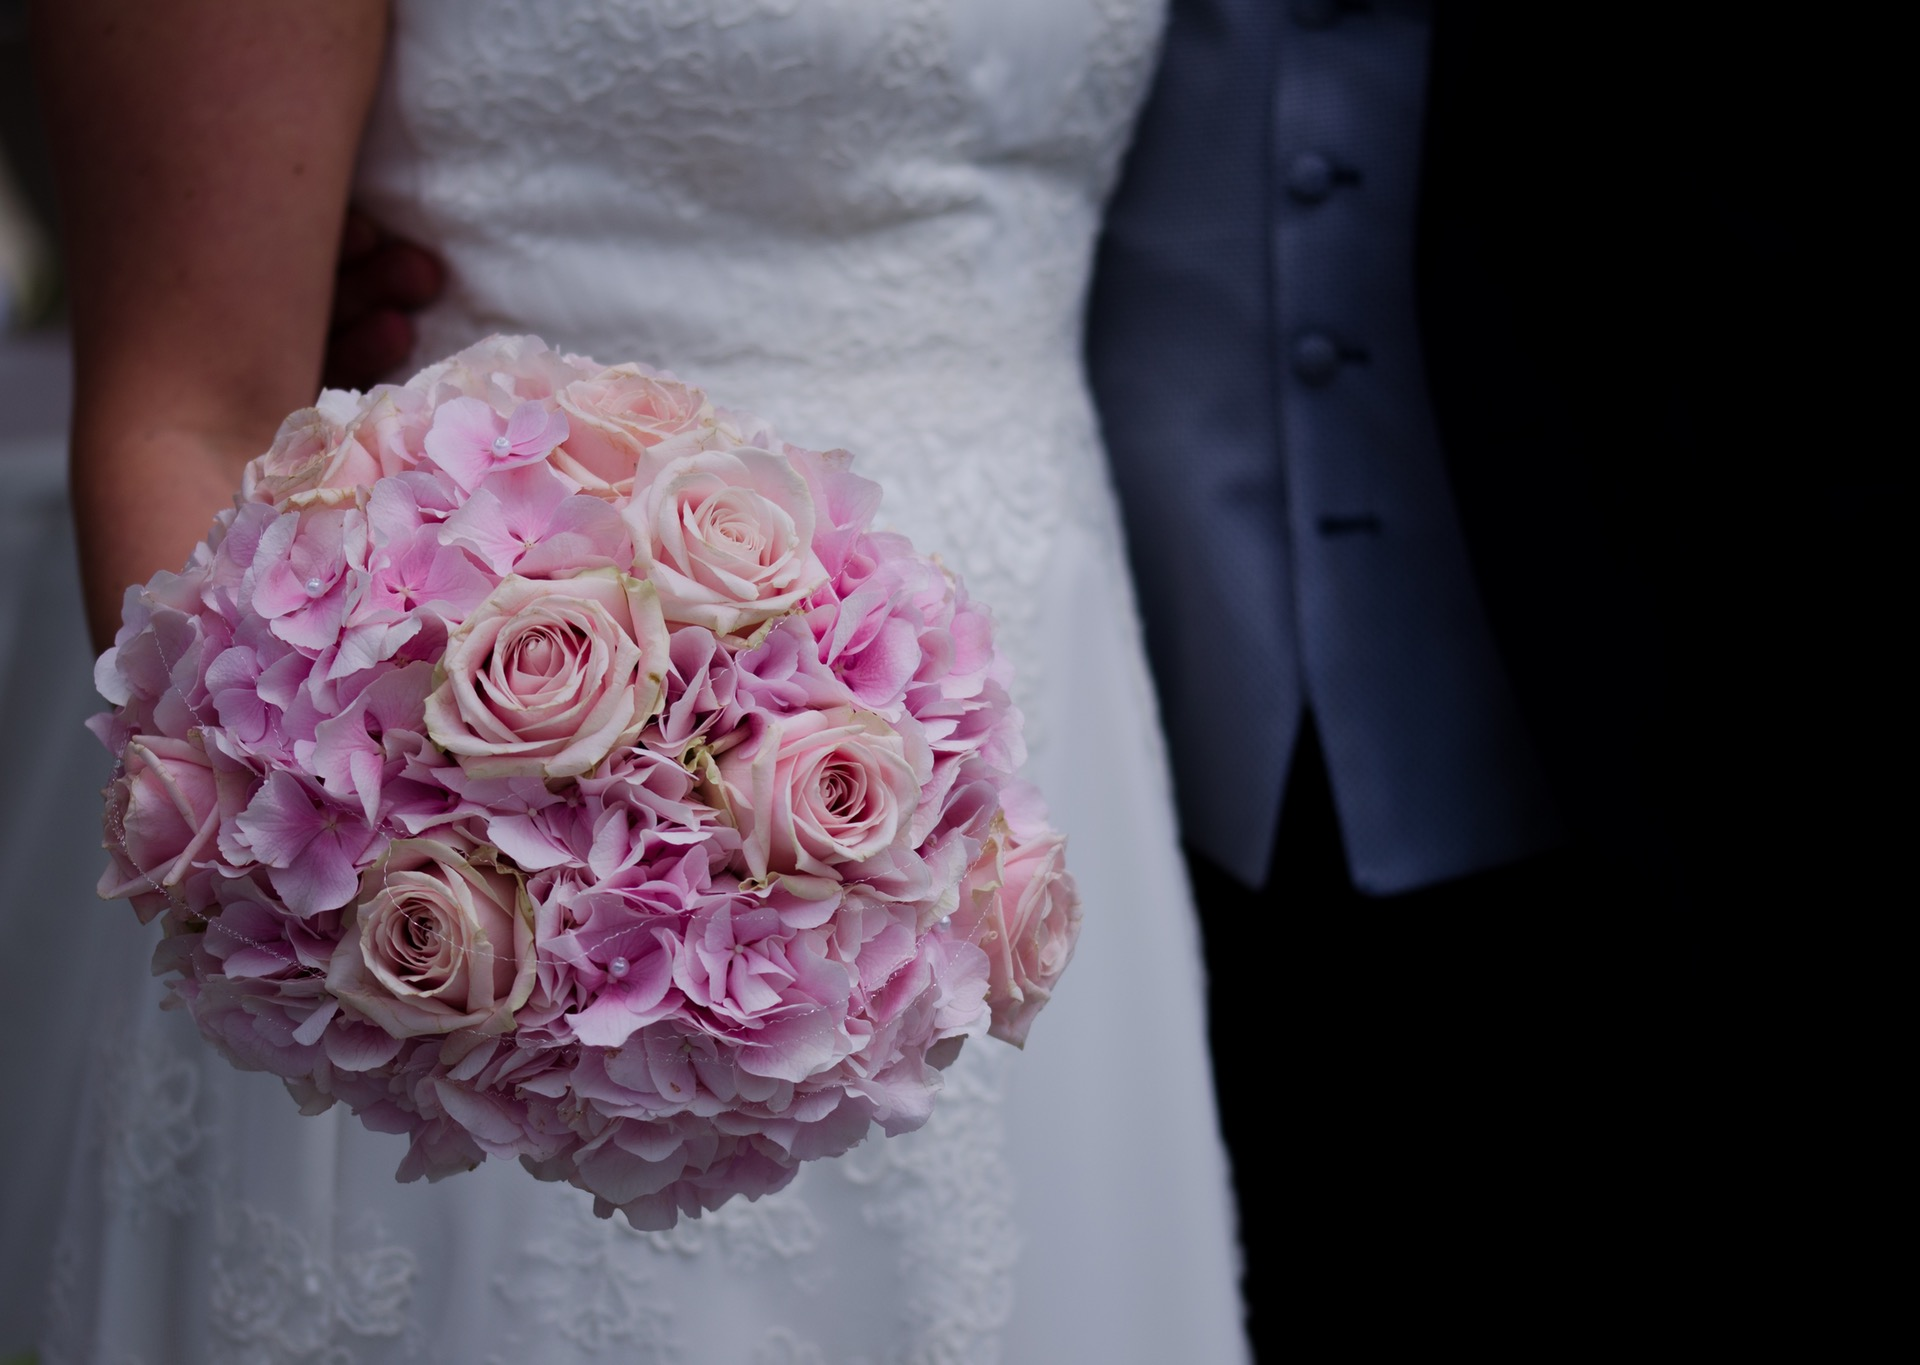 Best Wedding Spot: The Day I Marry Daniel Padilla